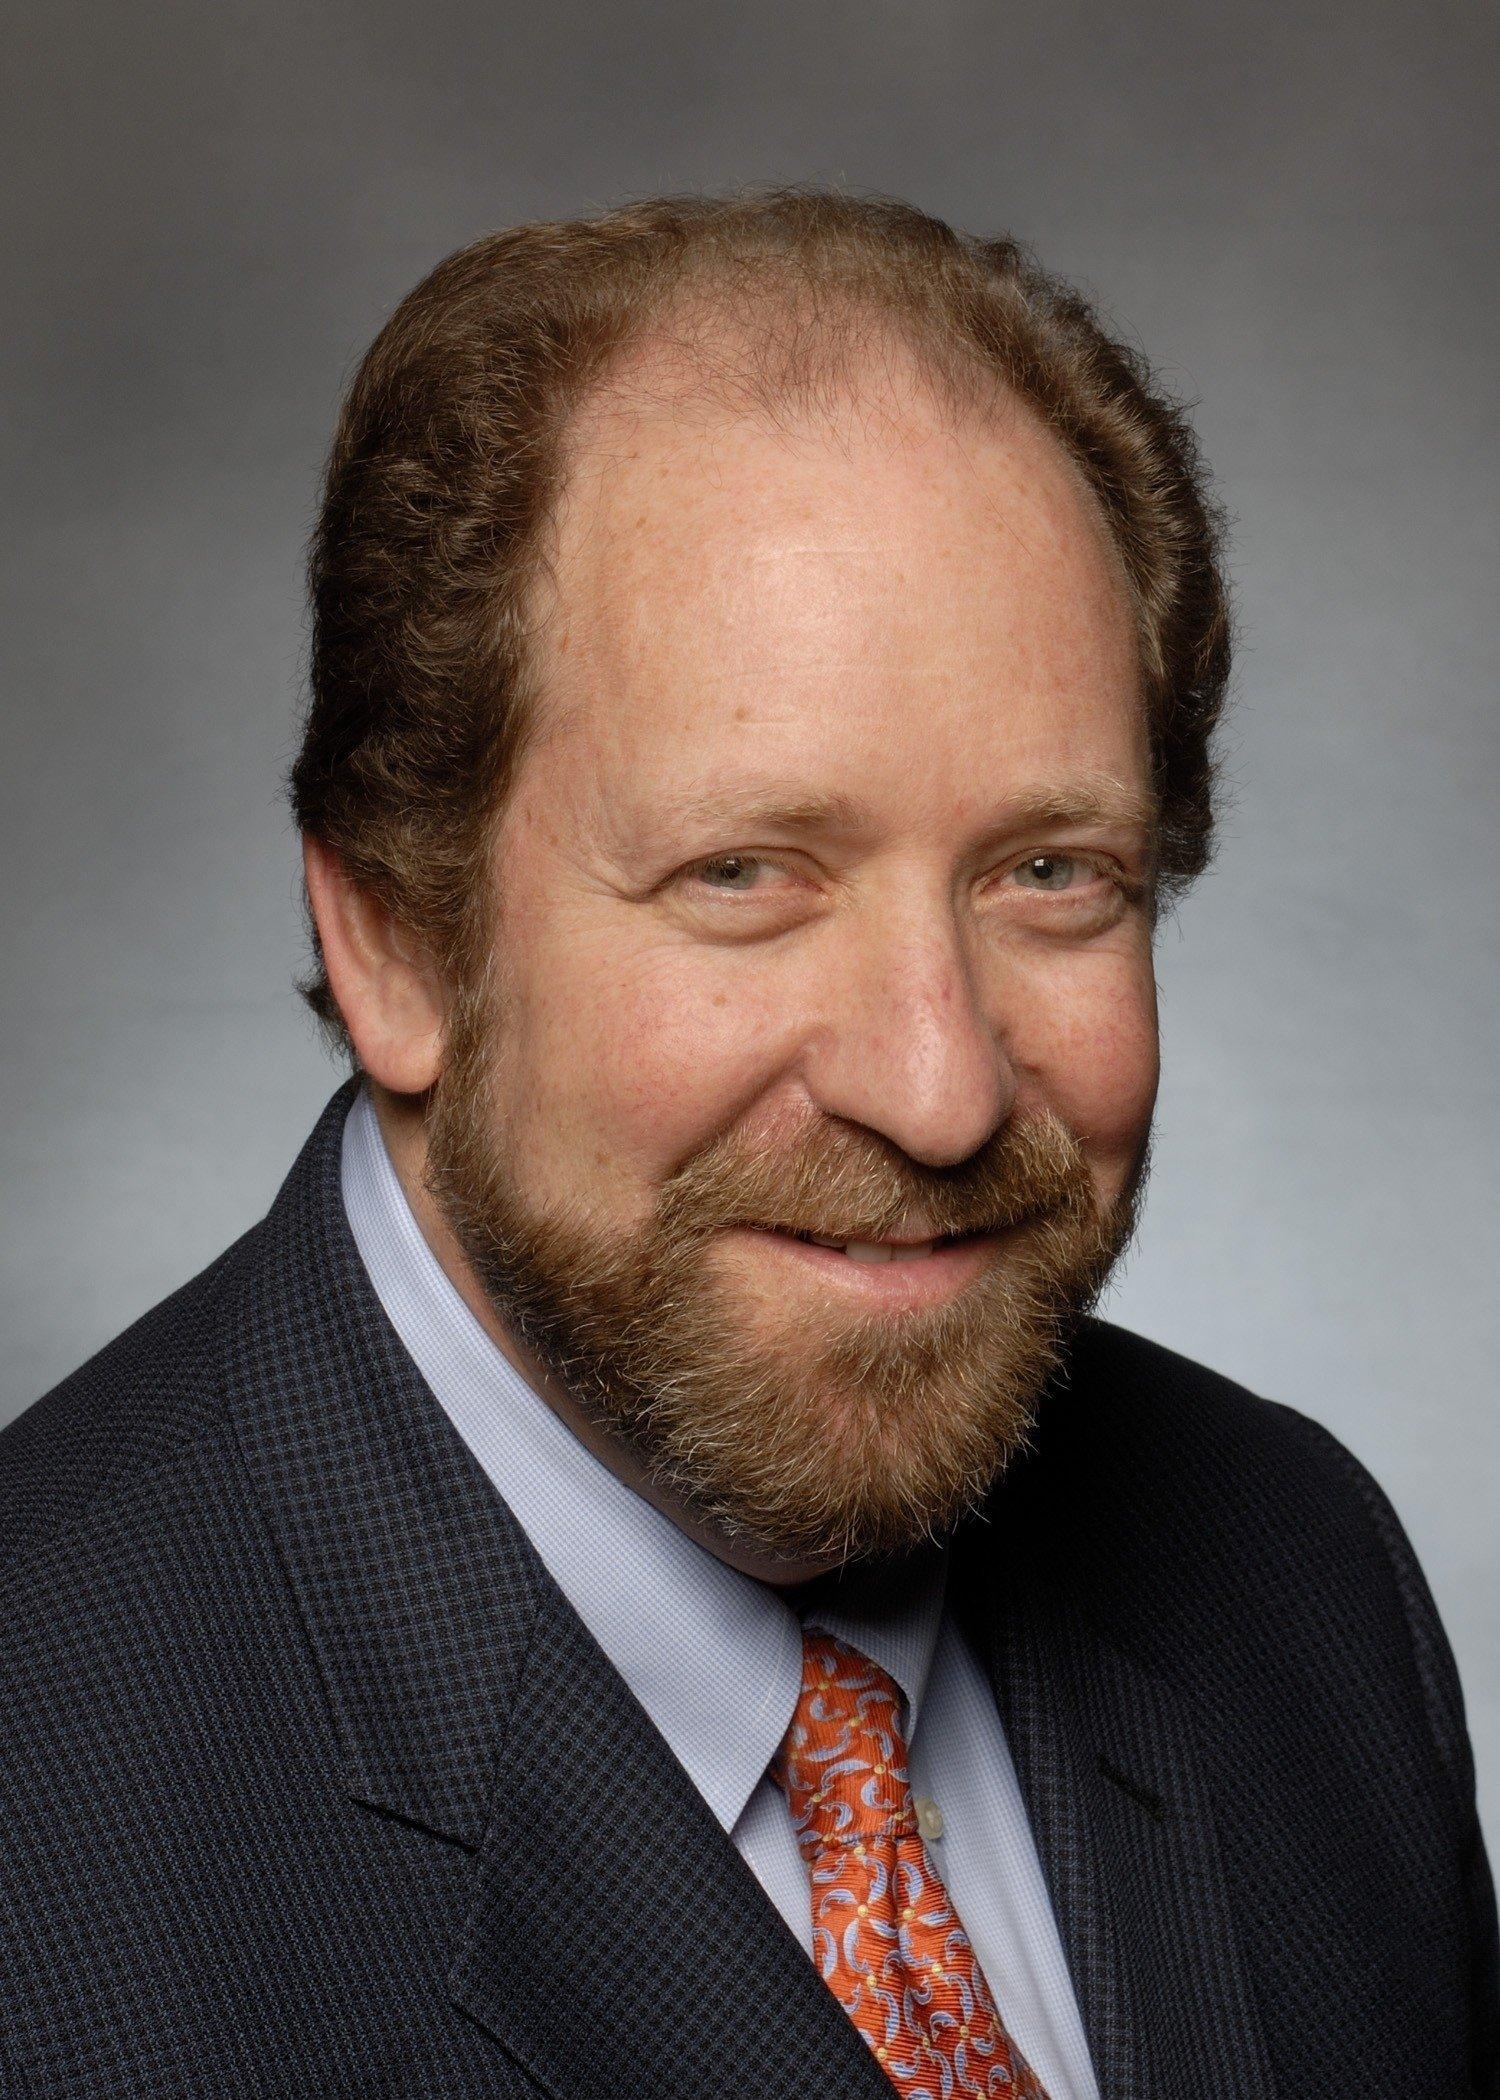 David M. Eisenberg, MD